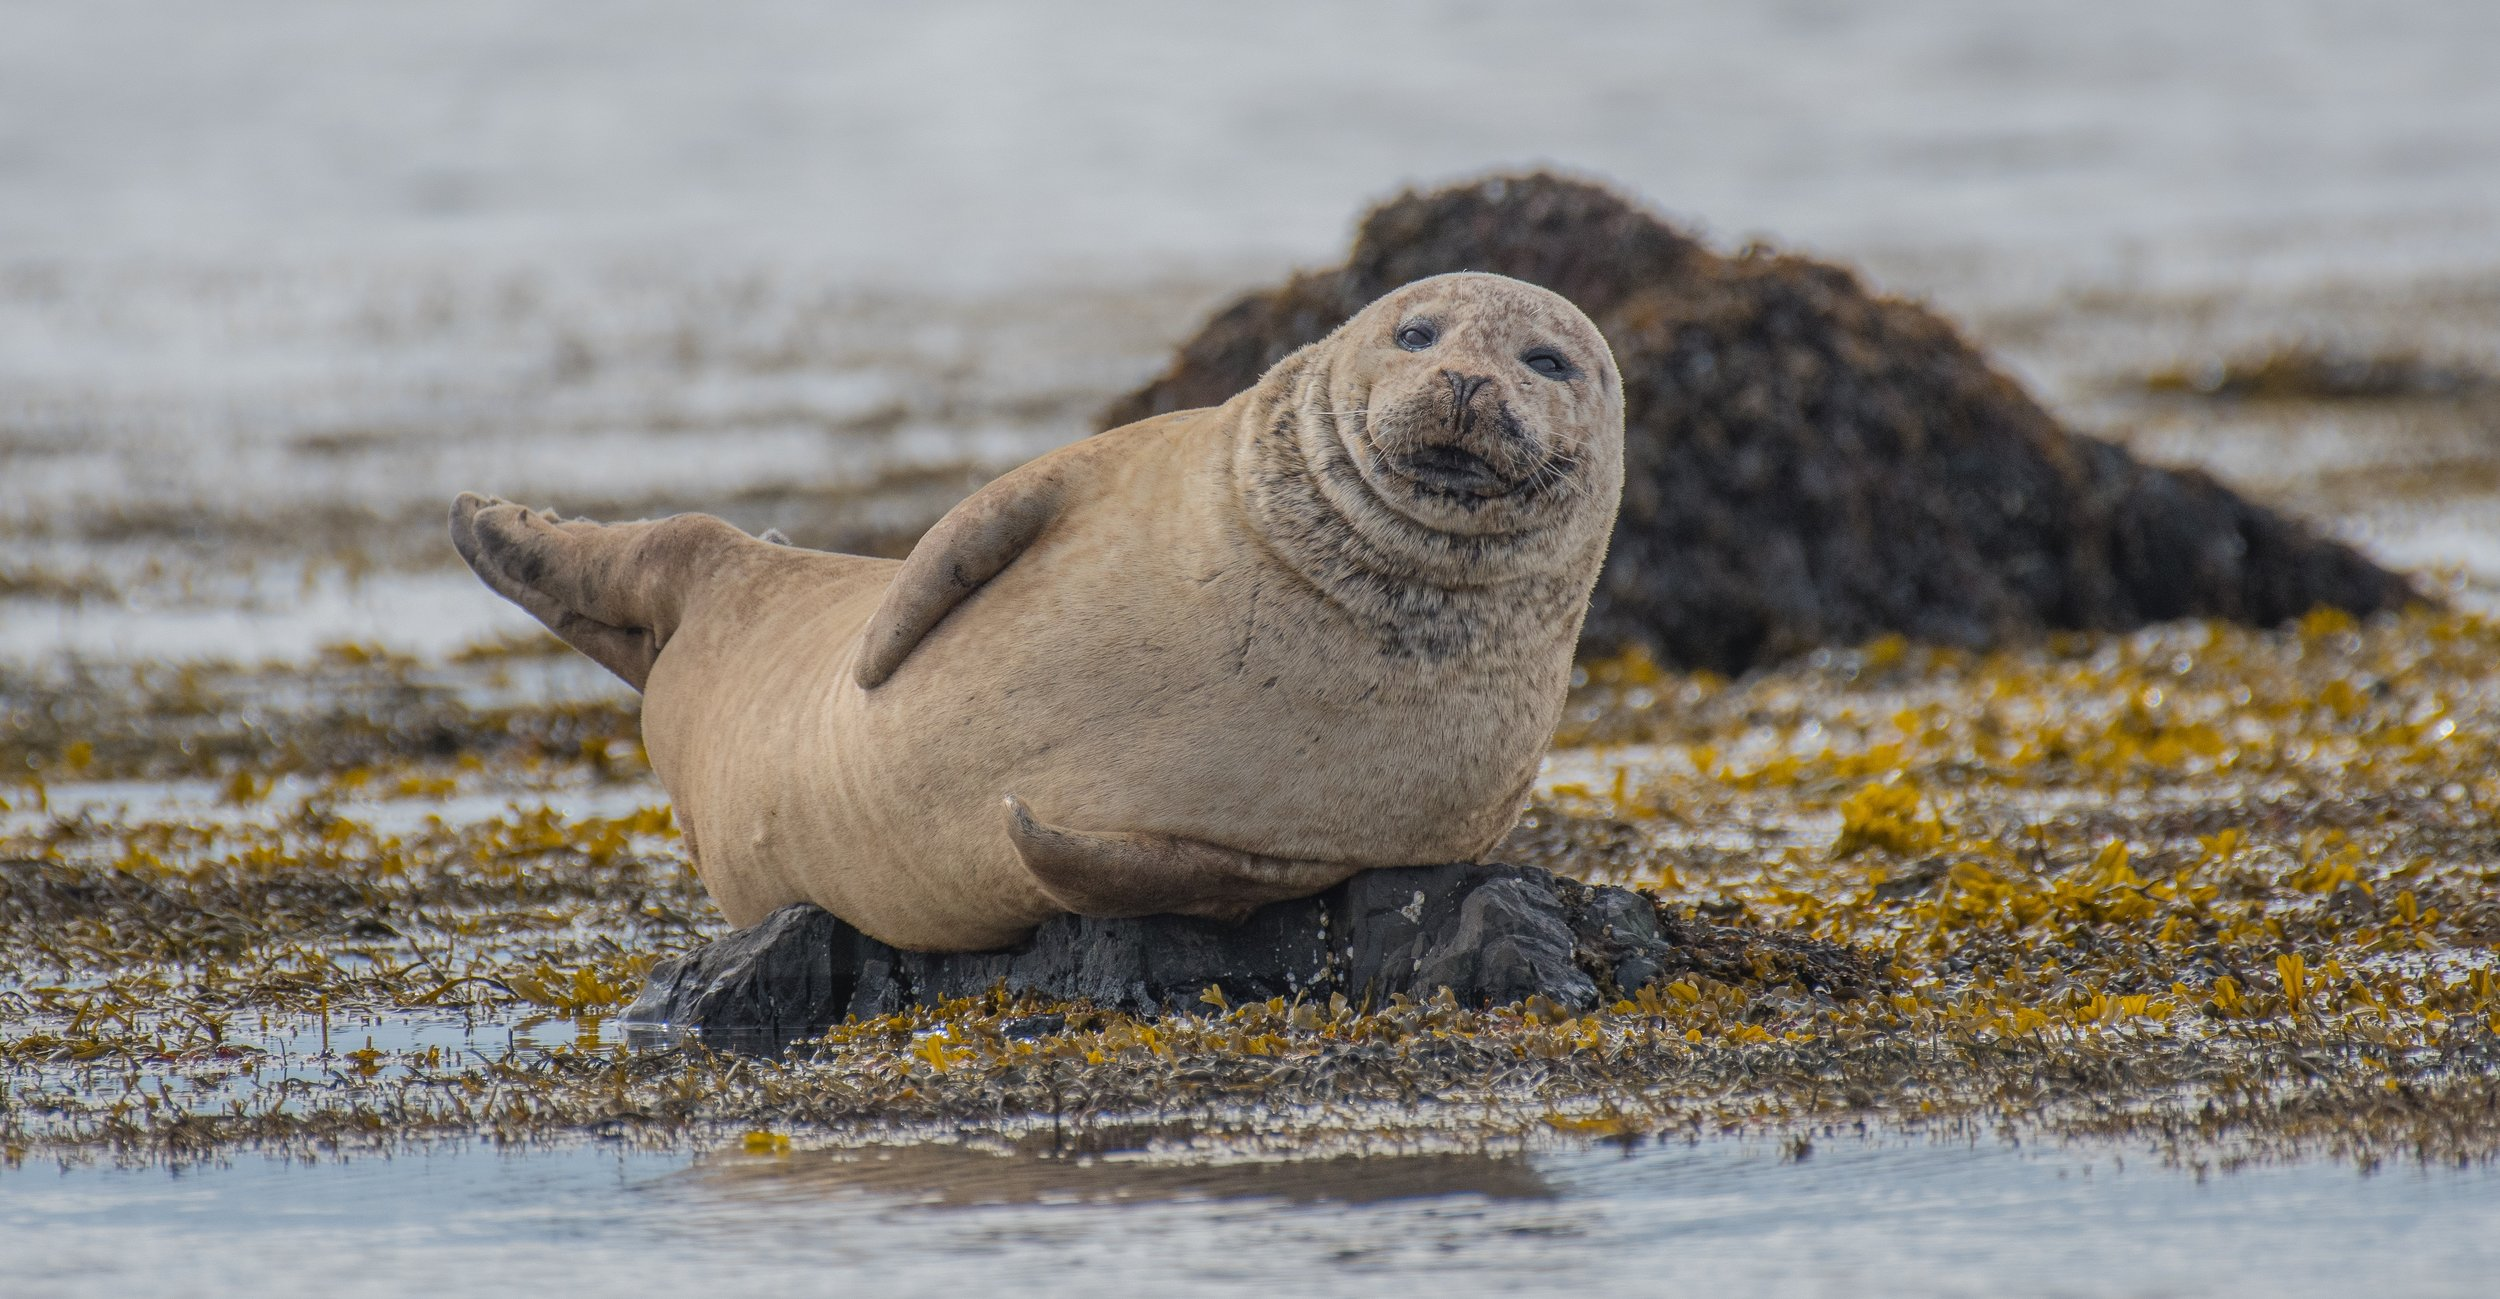 pascal-mauerhofer-Seal Iceland Up cW.jpg